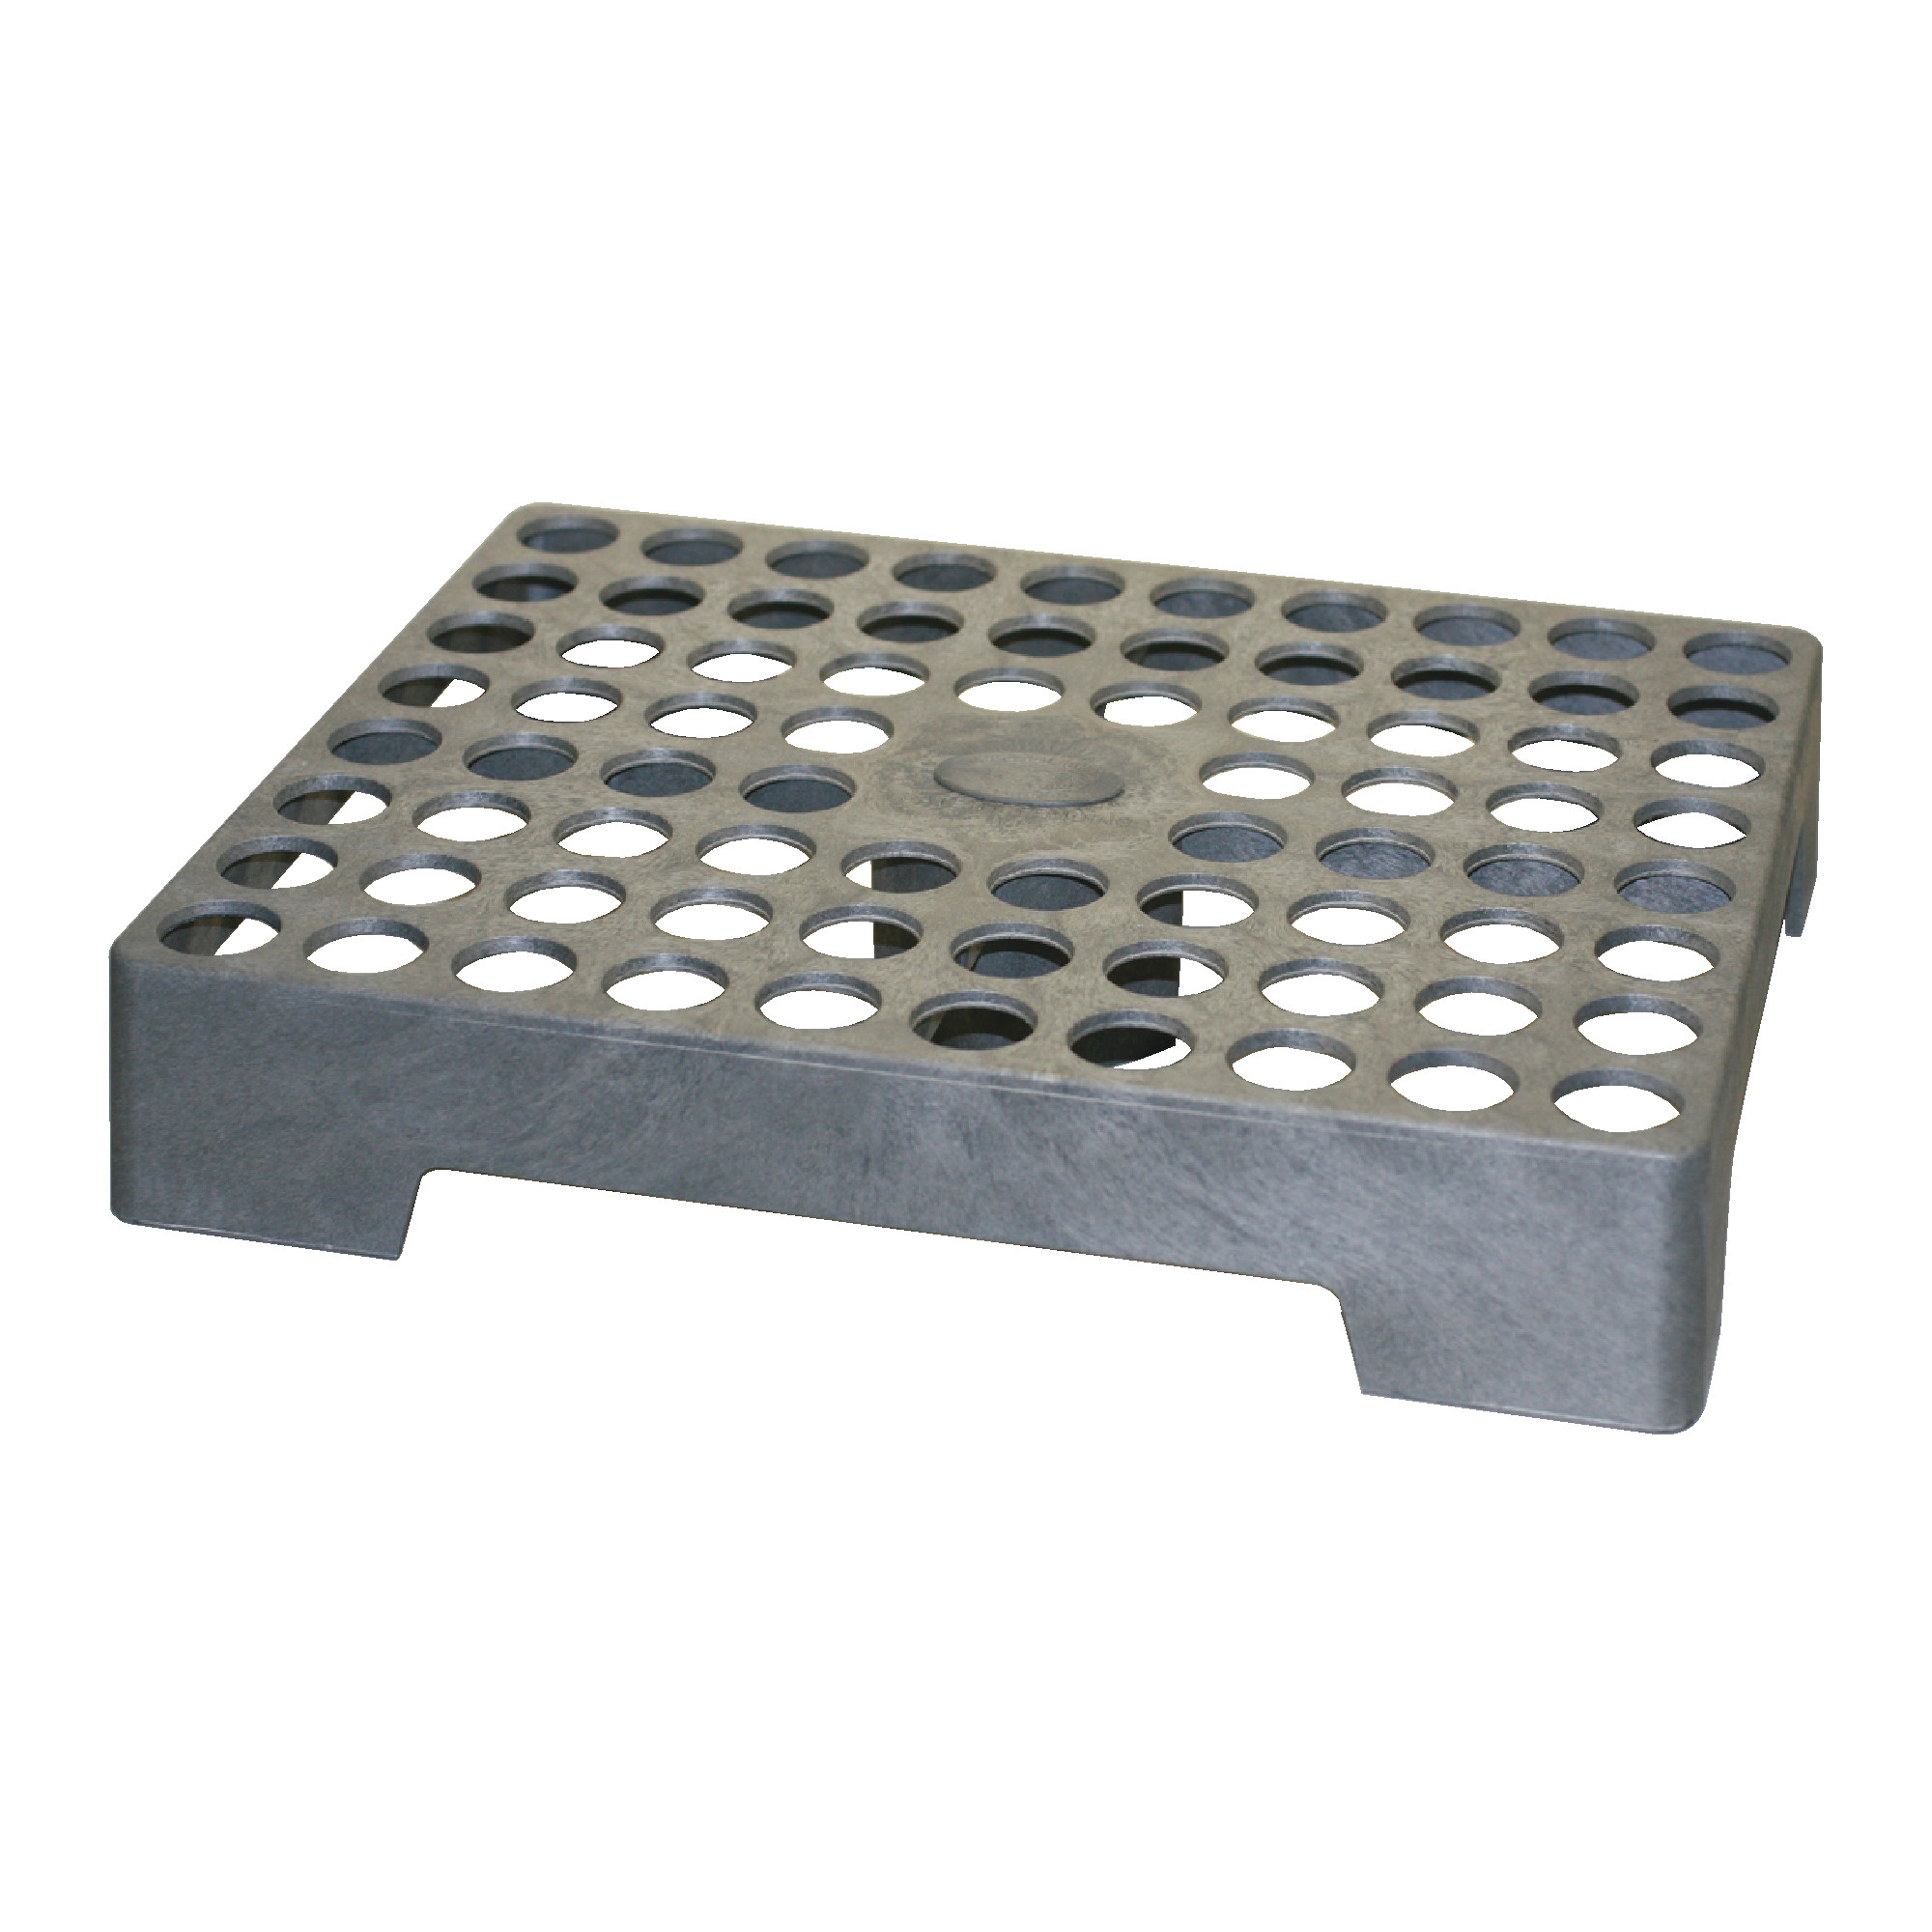 5C Collet Rack - 76 Holes